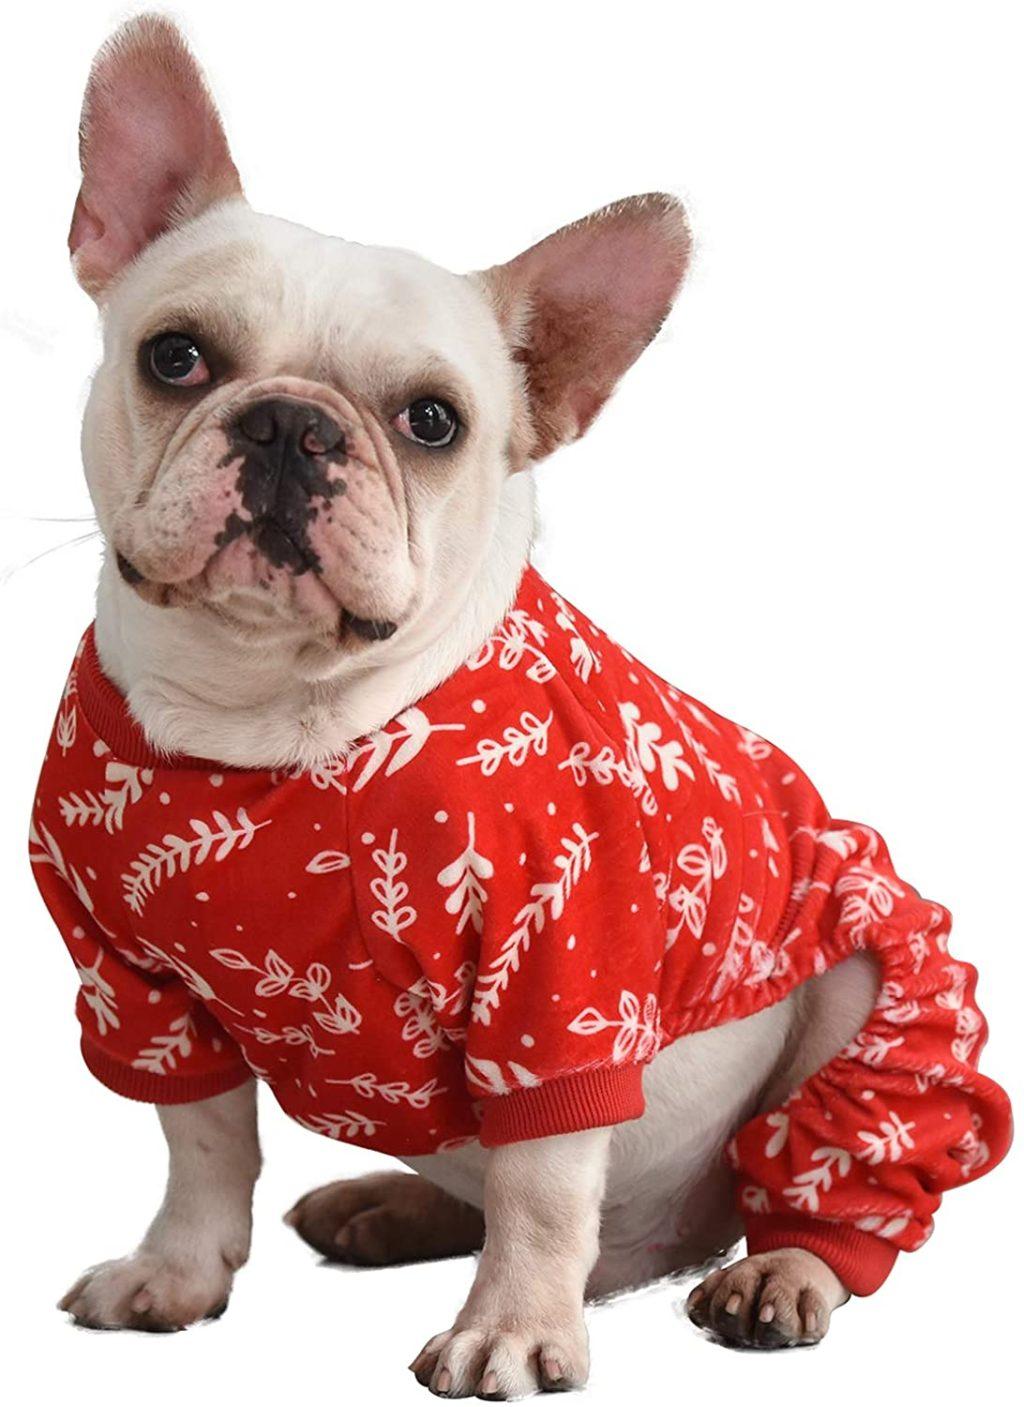 CuteBone-Christmas-Dog-Pajamas-Jumpsuit-1024x1407 Cutest 10 Pajamas for Dogs on Amazon in 2021/2022